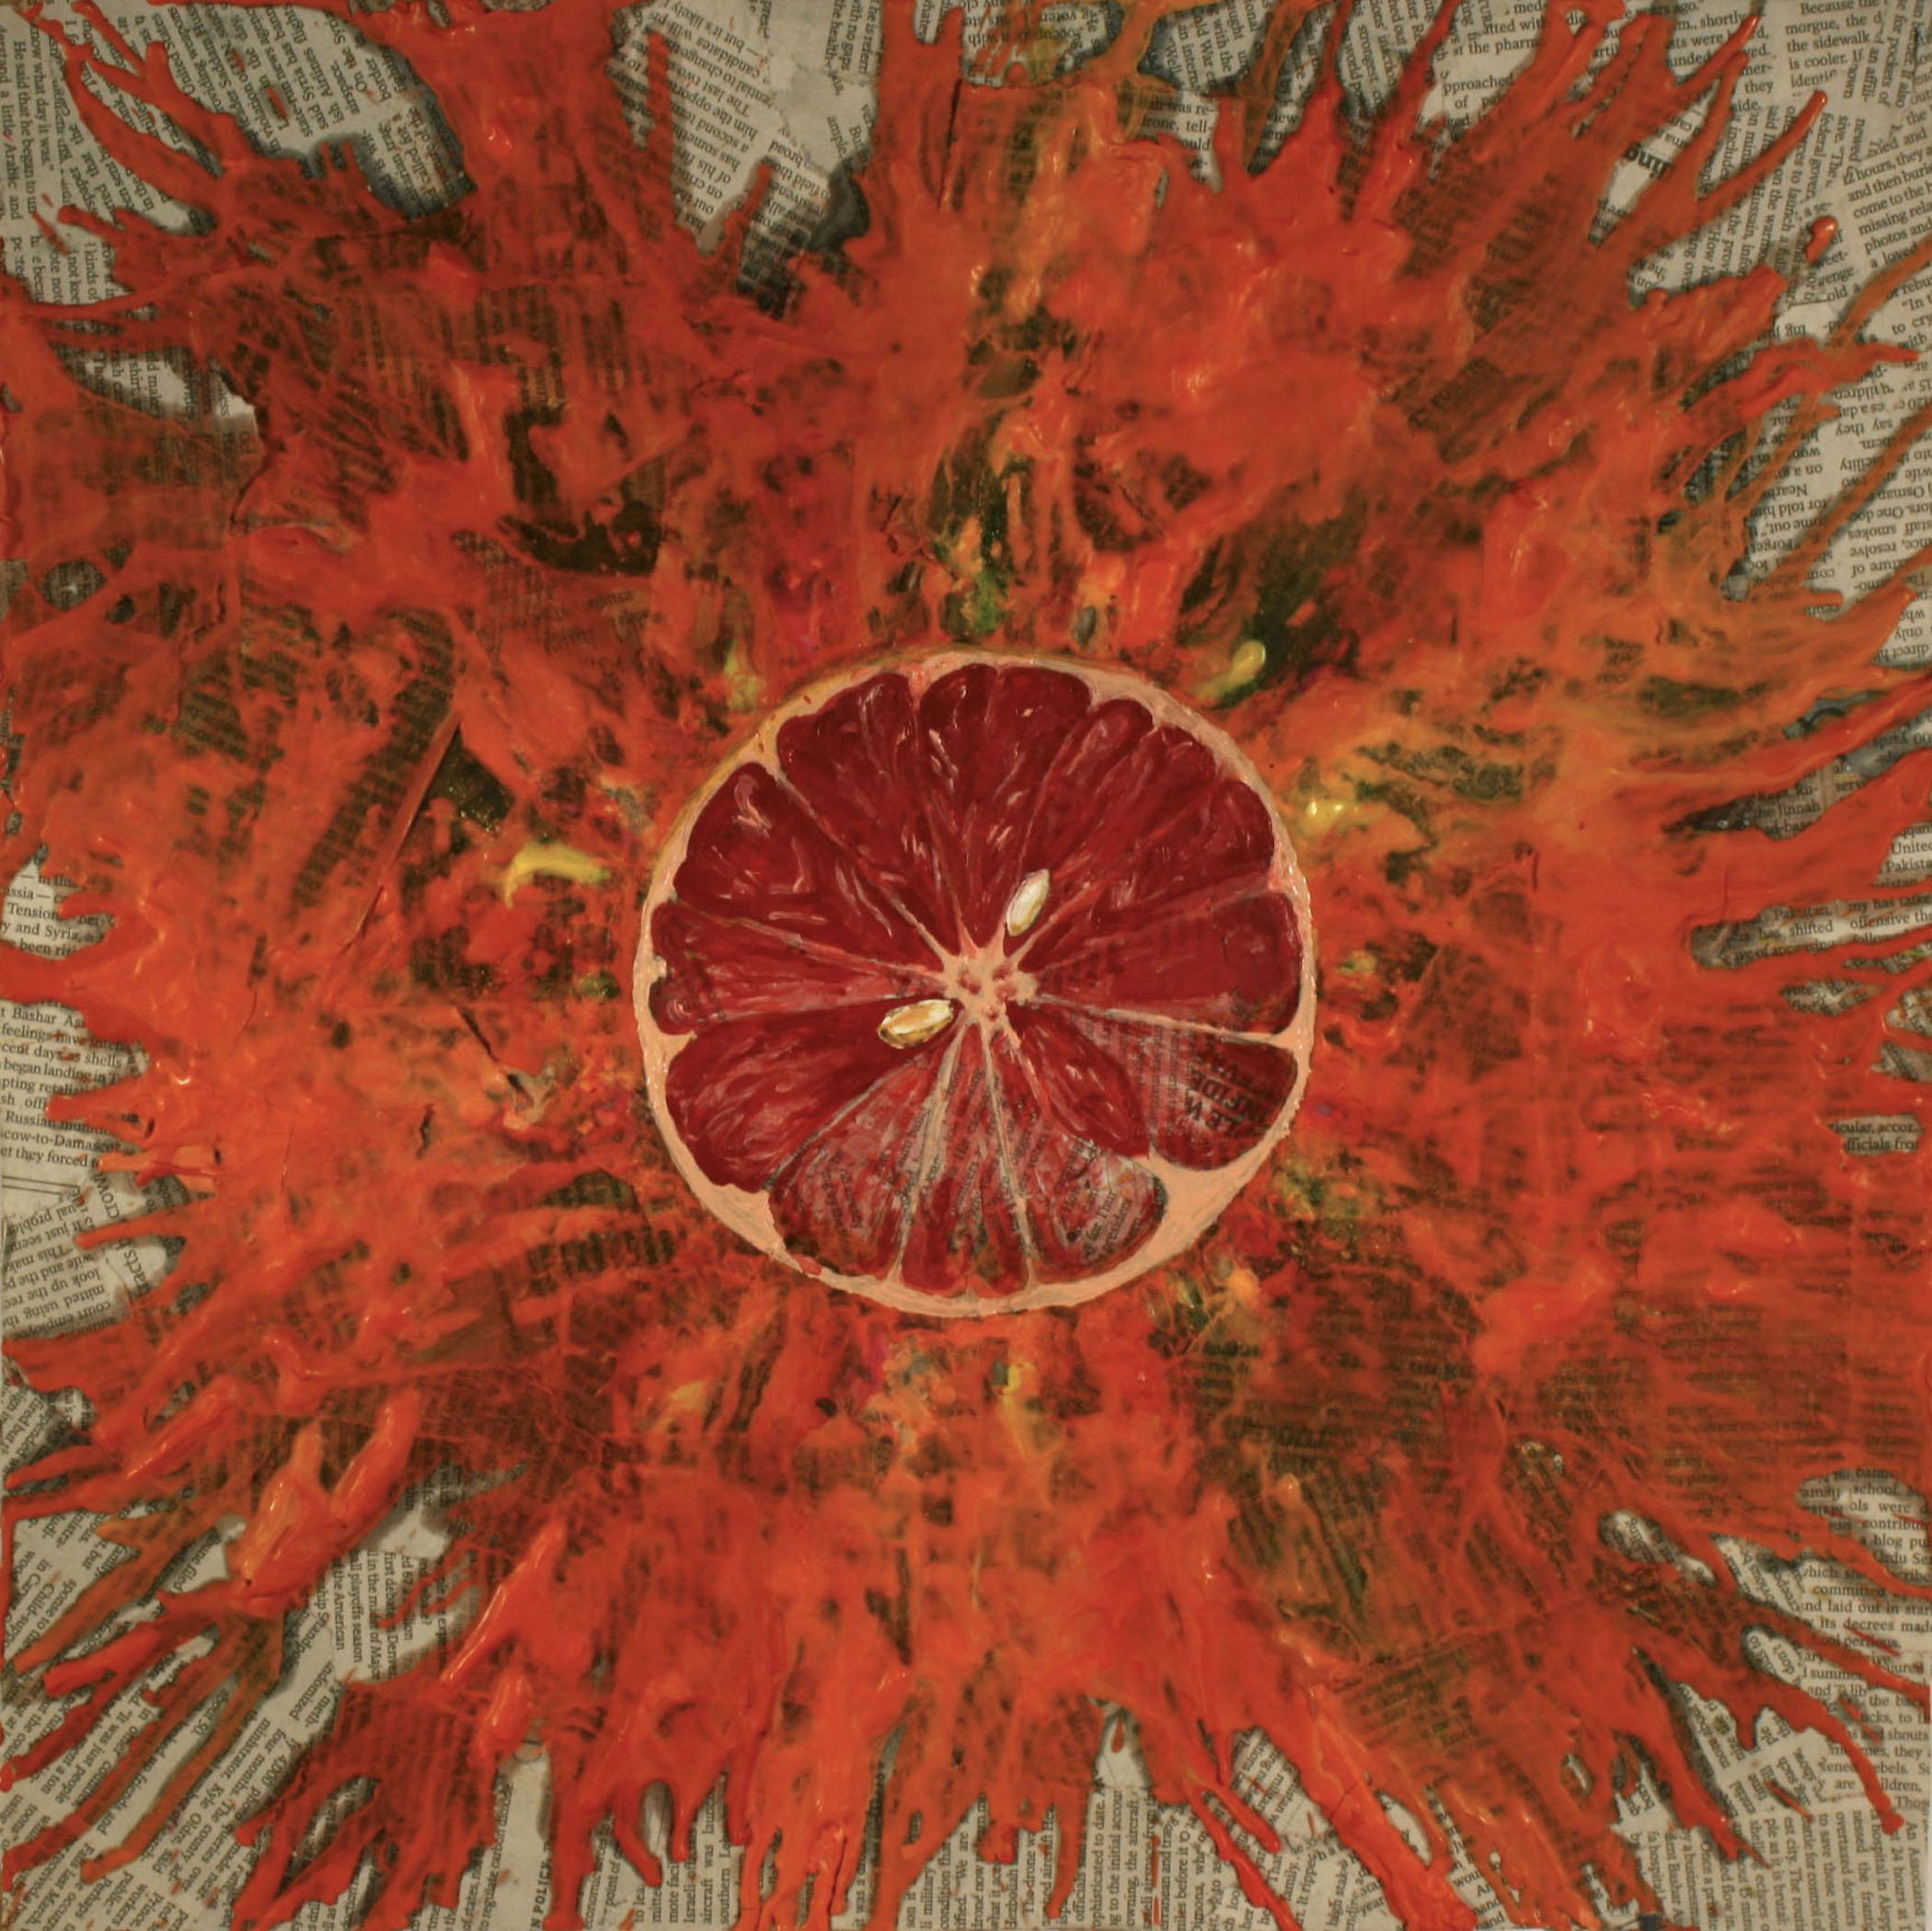 Exploding Grapefruit